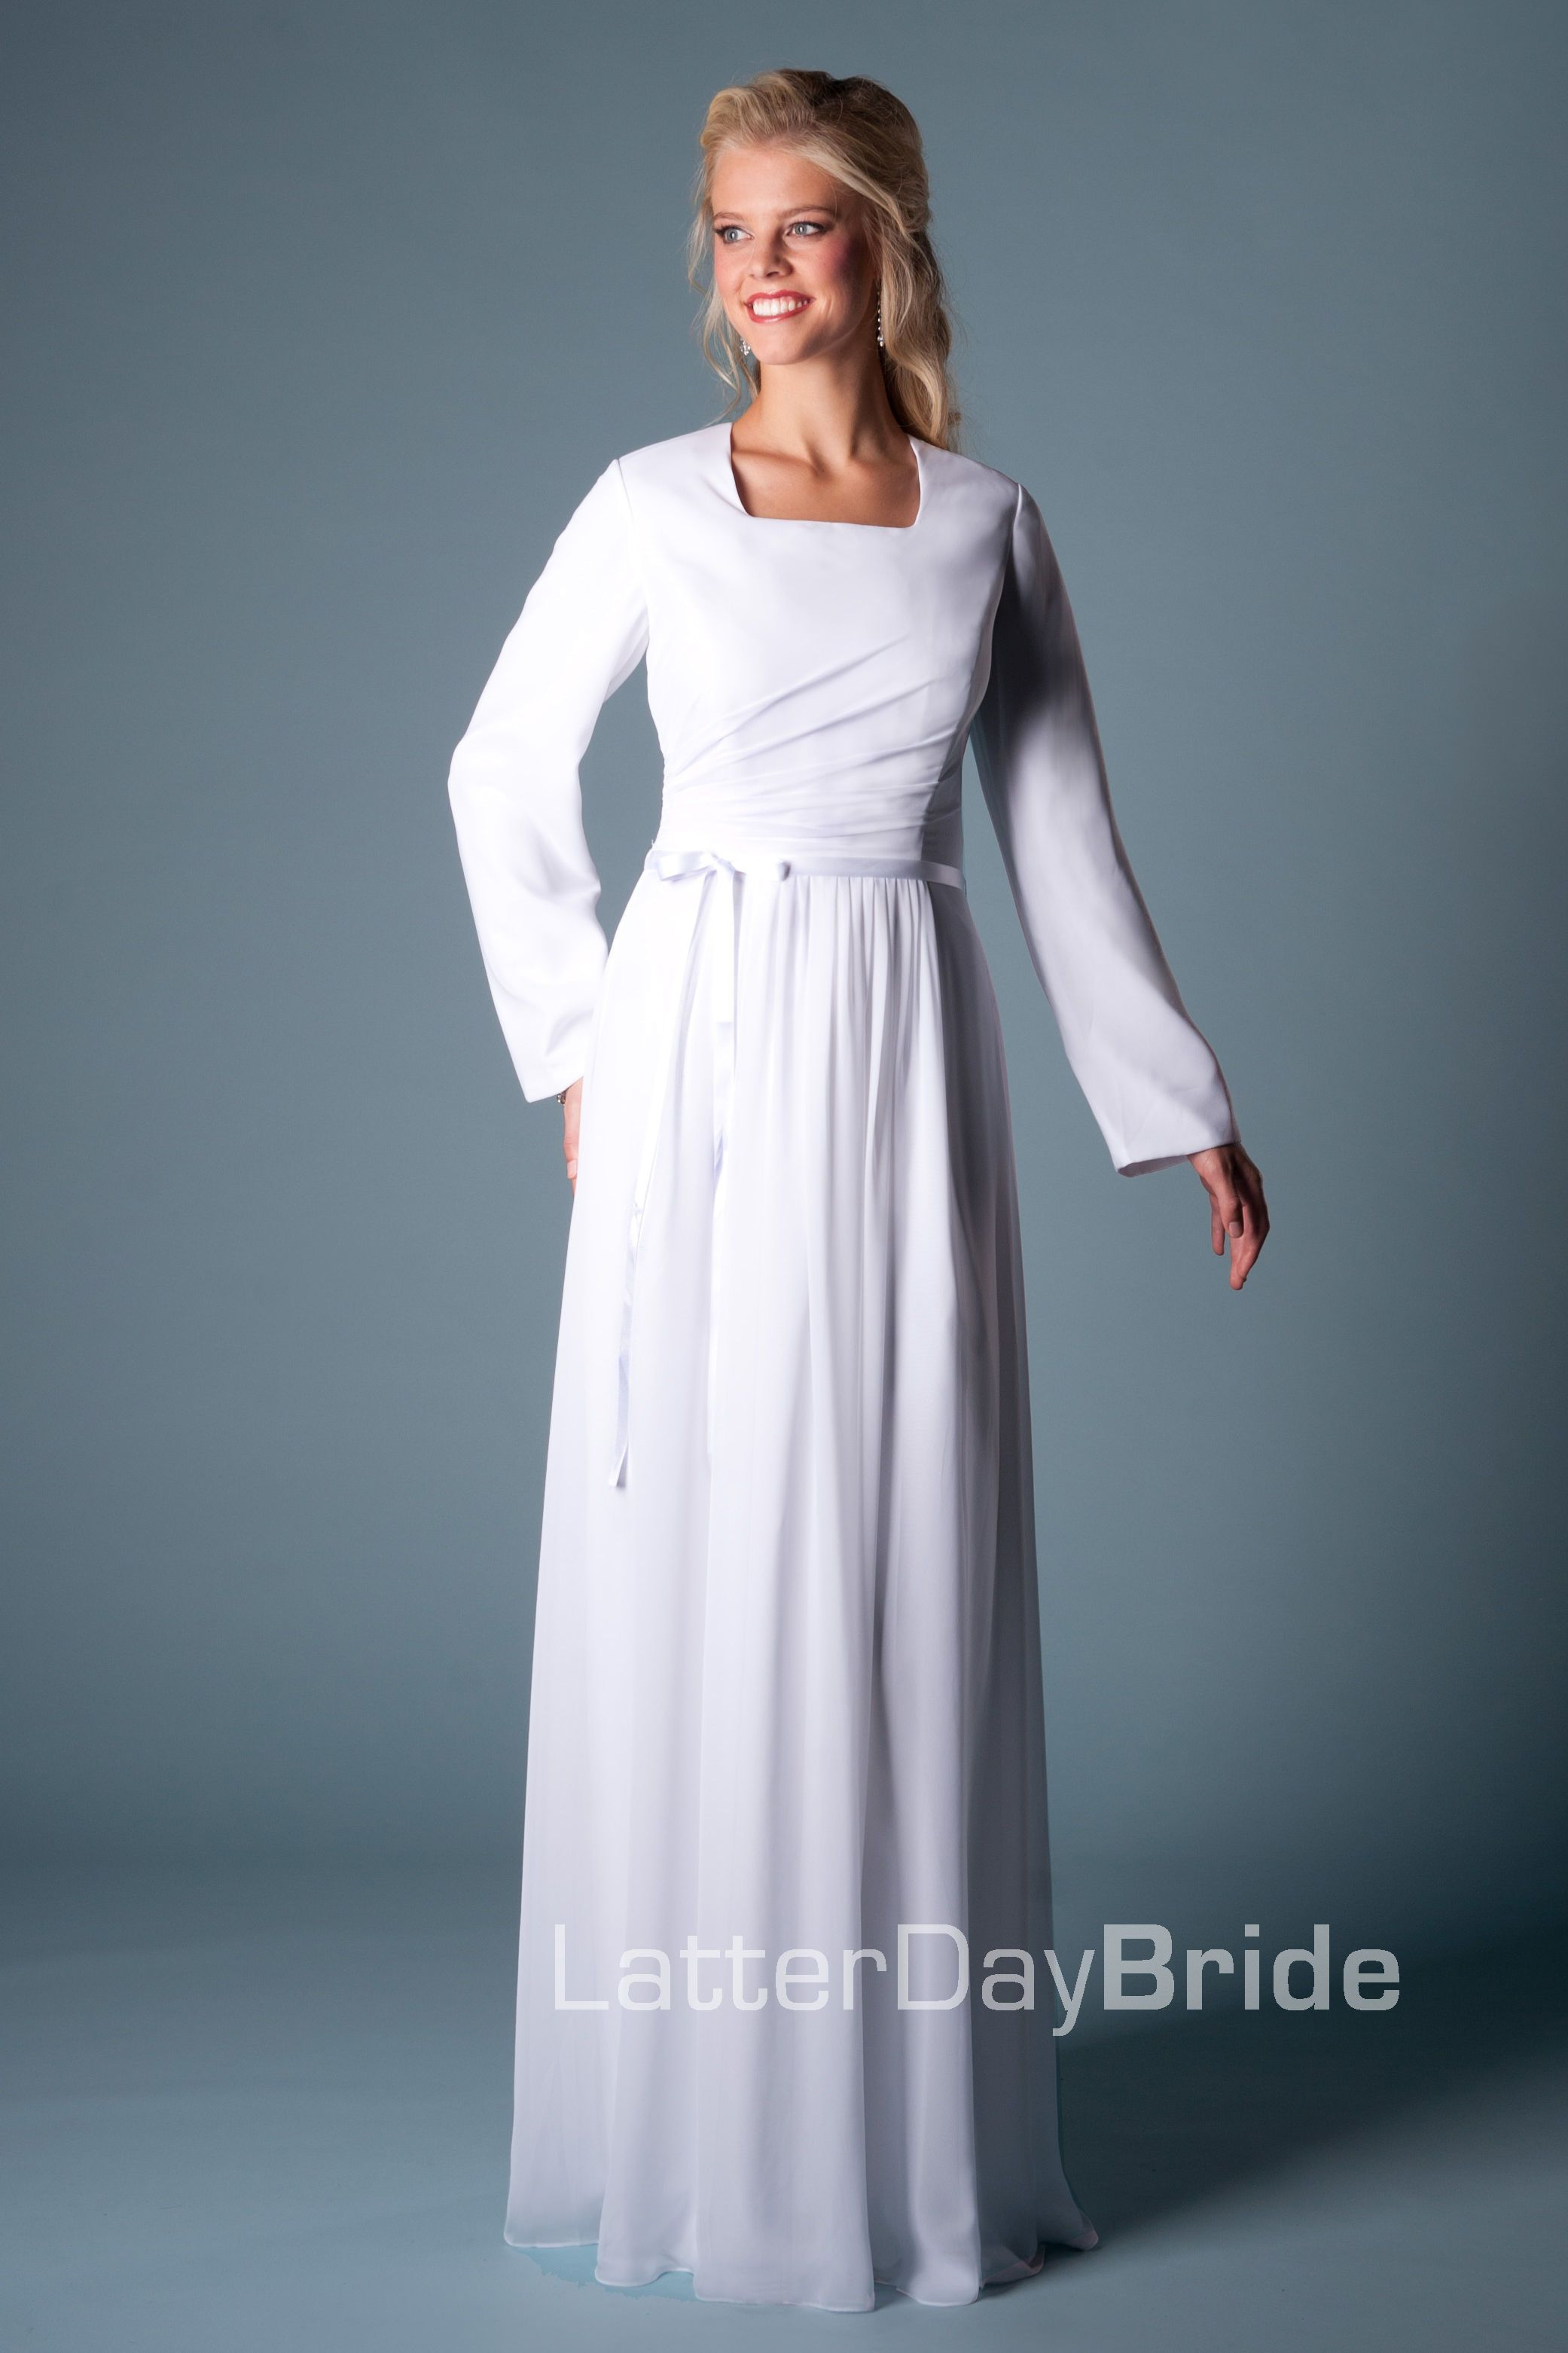 Modest Wedding Dress, Raleigh | LatterDayBride & Prom -Modest Mormon ...